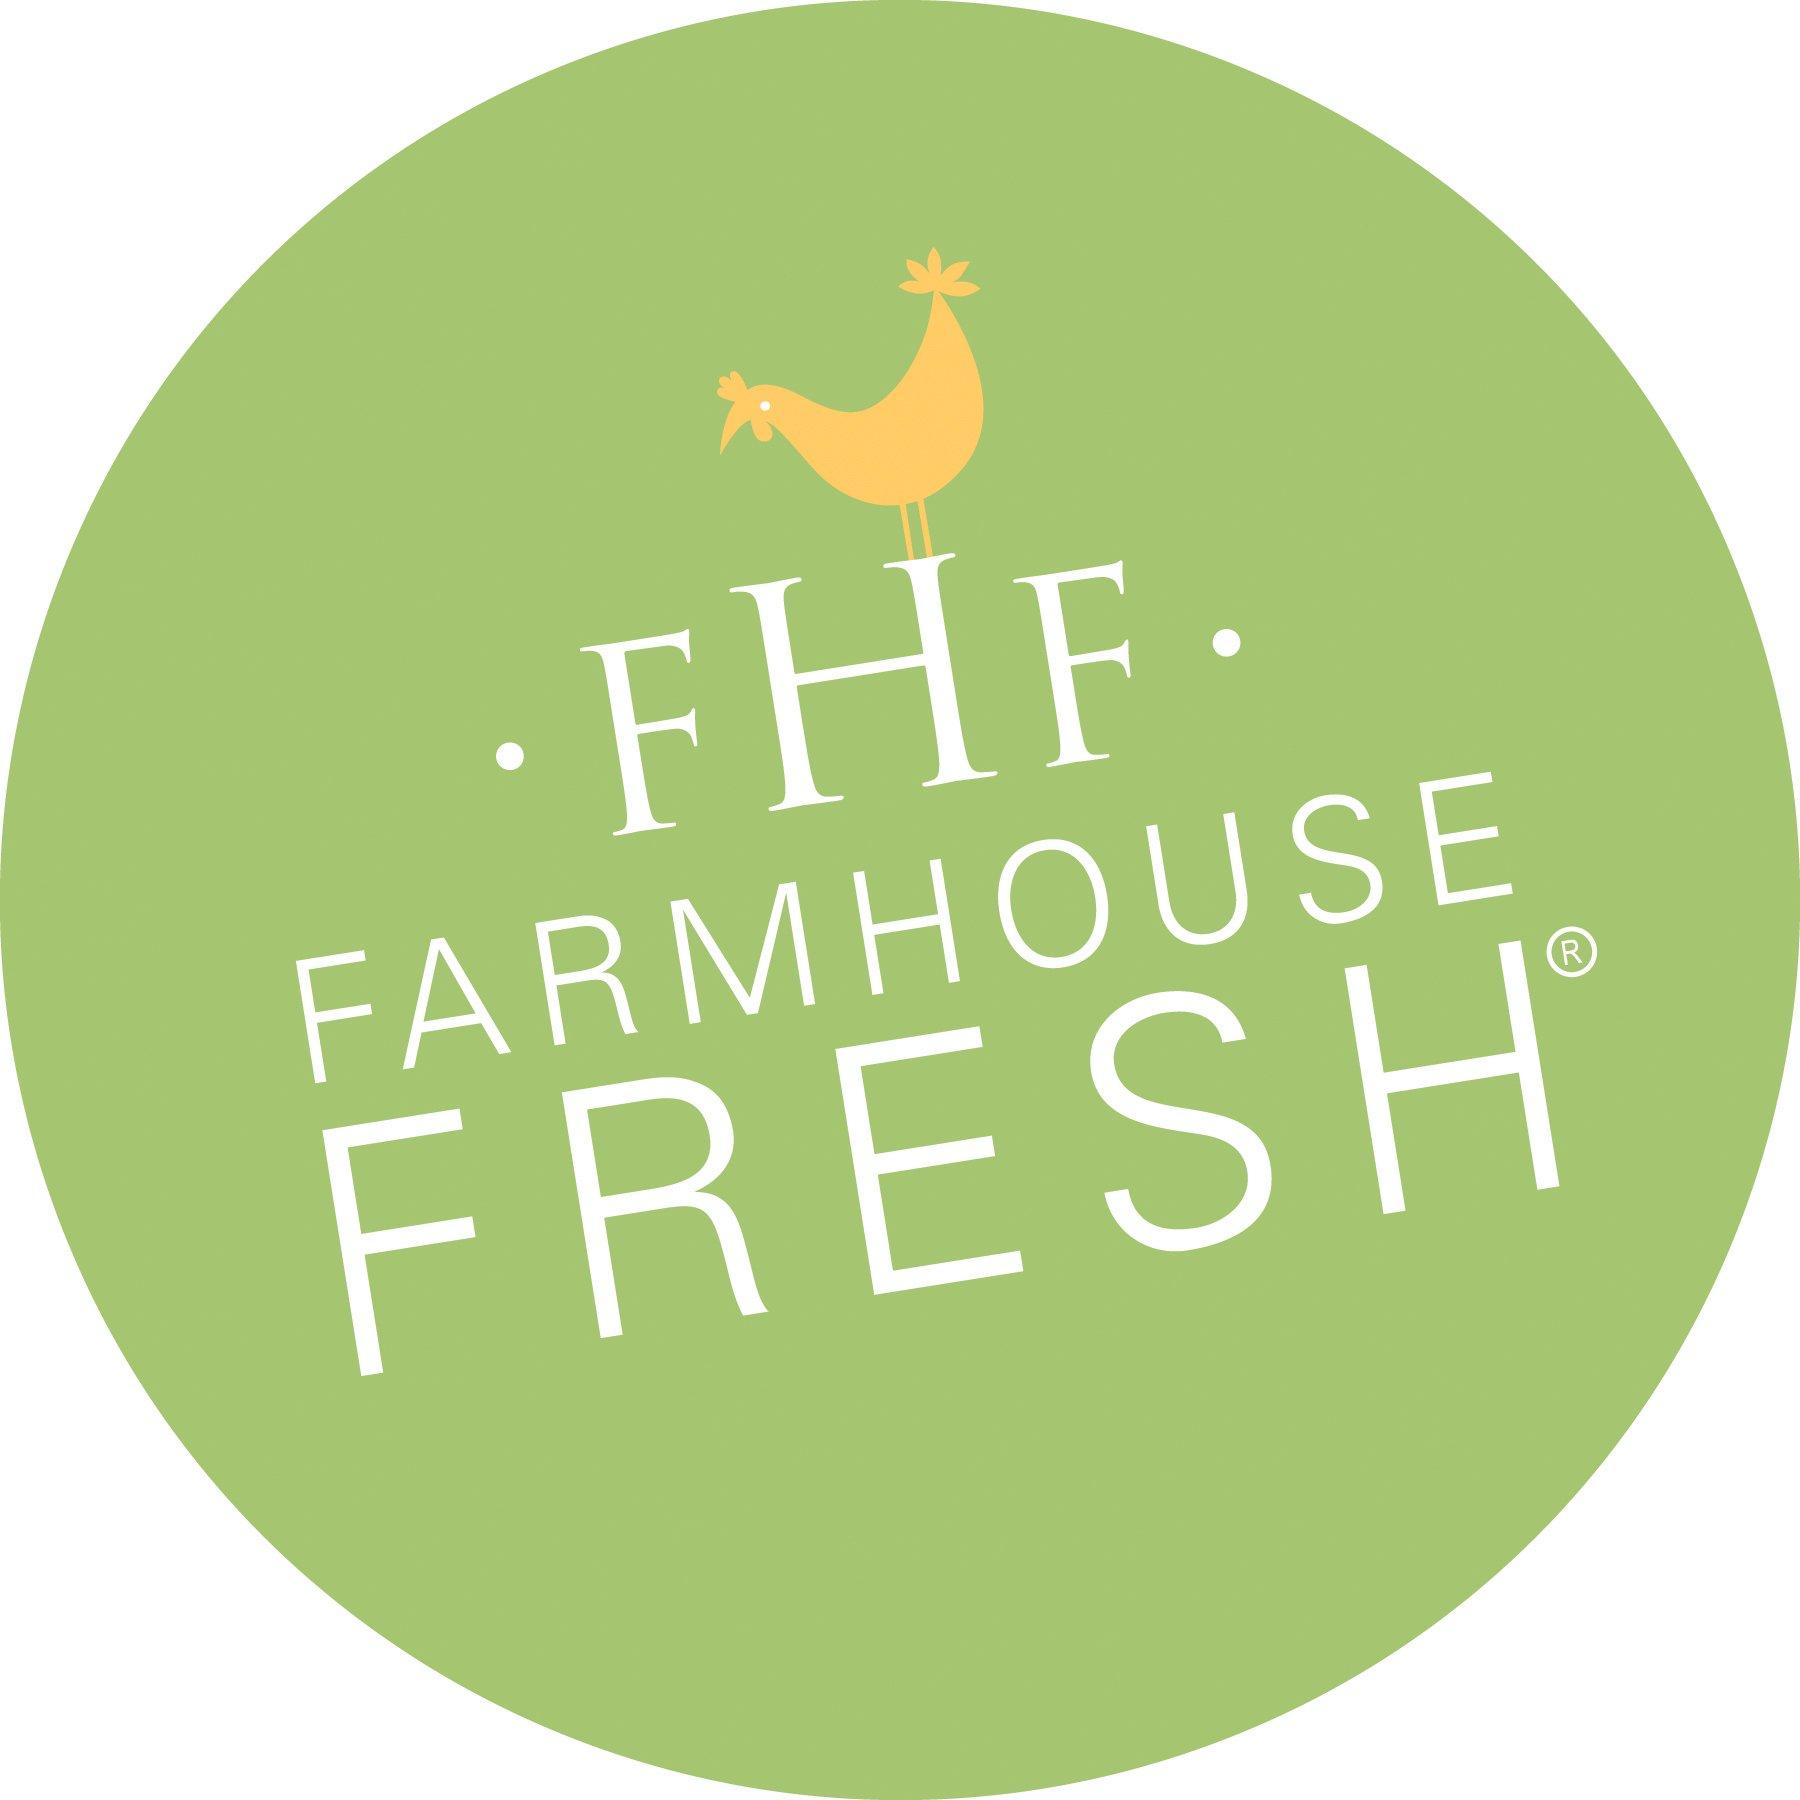 Farmhouse Fresh Skin Care Products